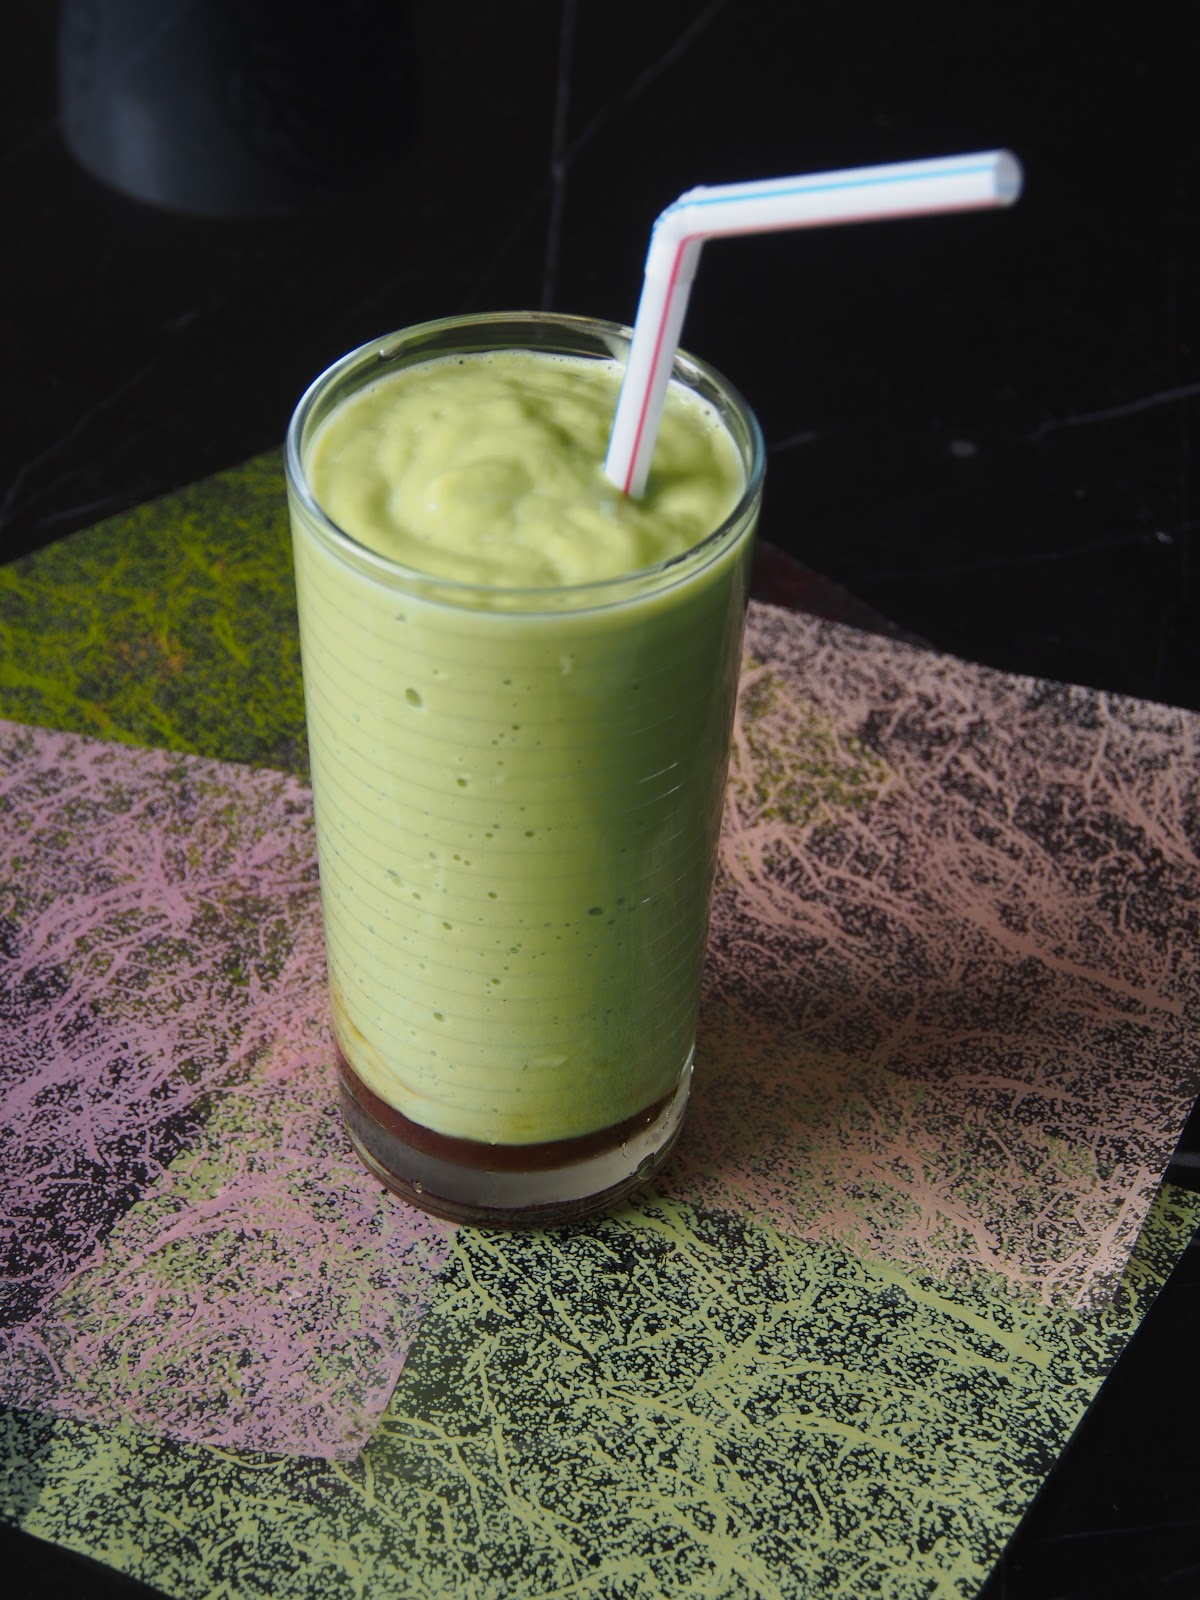 iCookiBakeiShoot: Avocado Milkshake